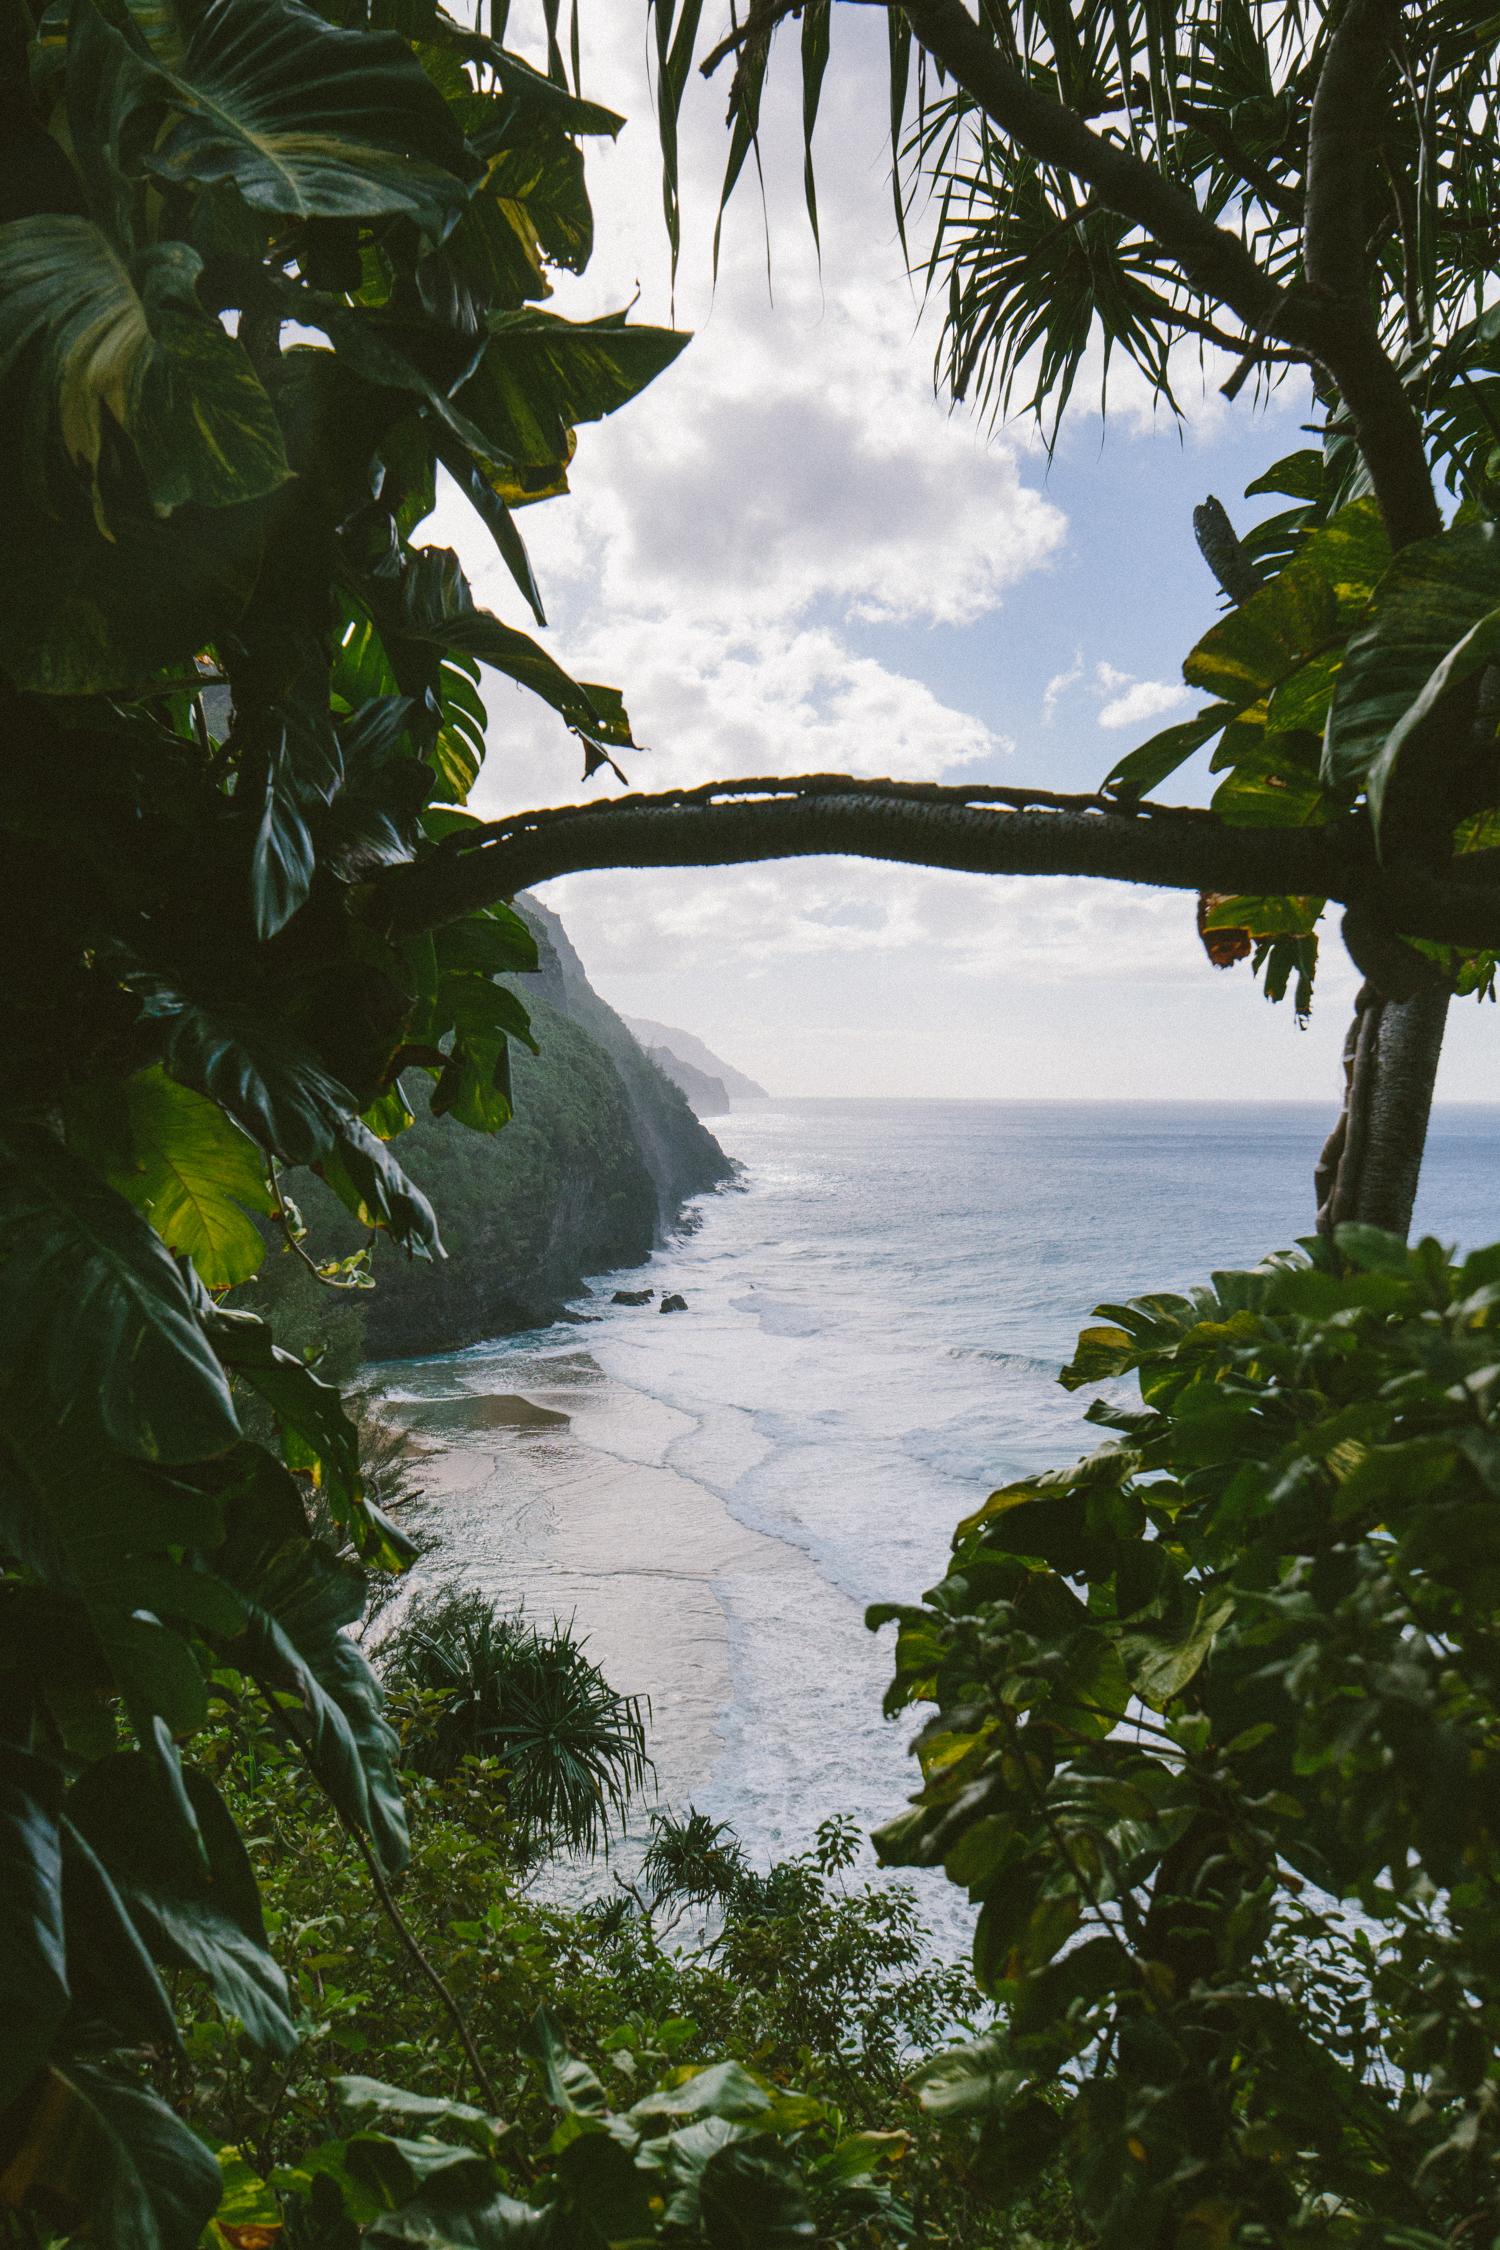 3-kauaiHawaii2014-10ED0103.jpg